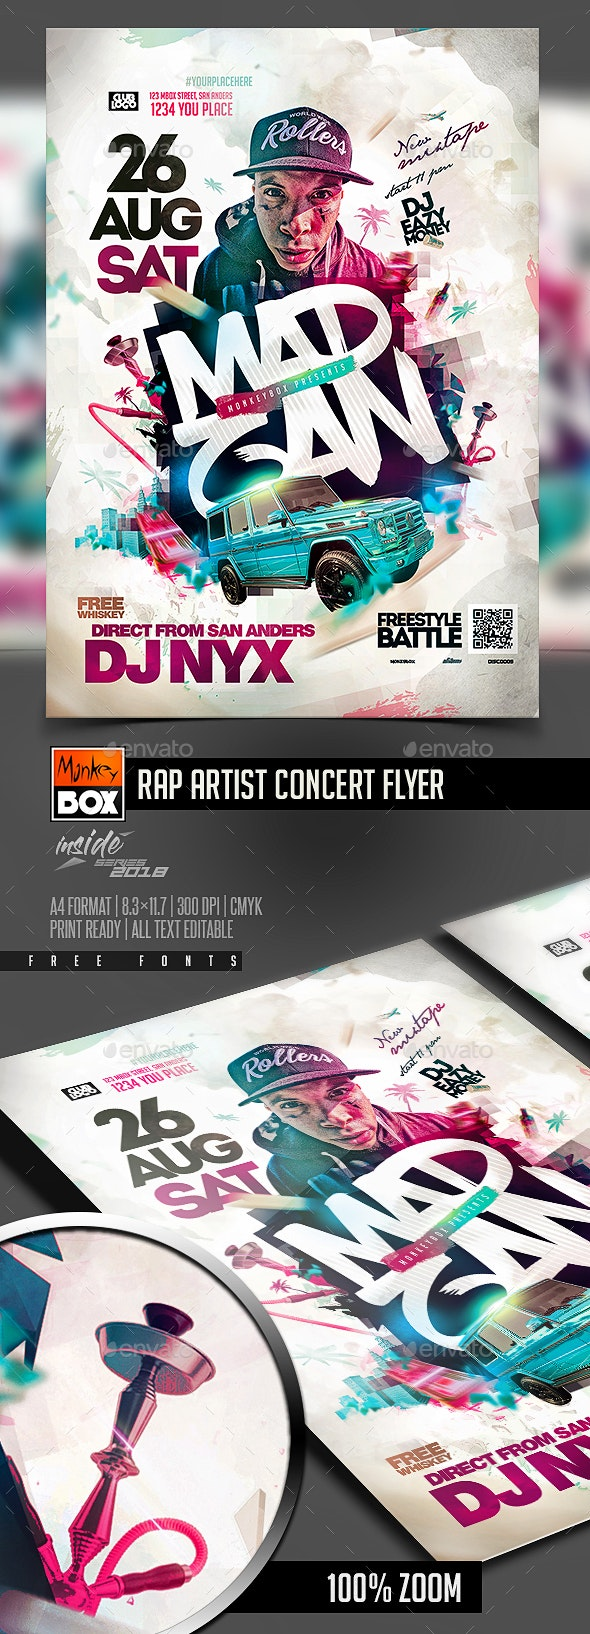 Rap Artist Concert Flyer - Flyers Print Templates